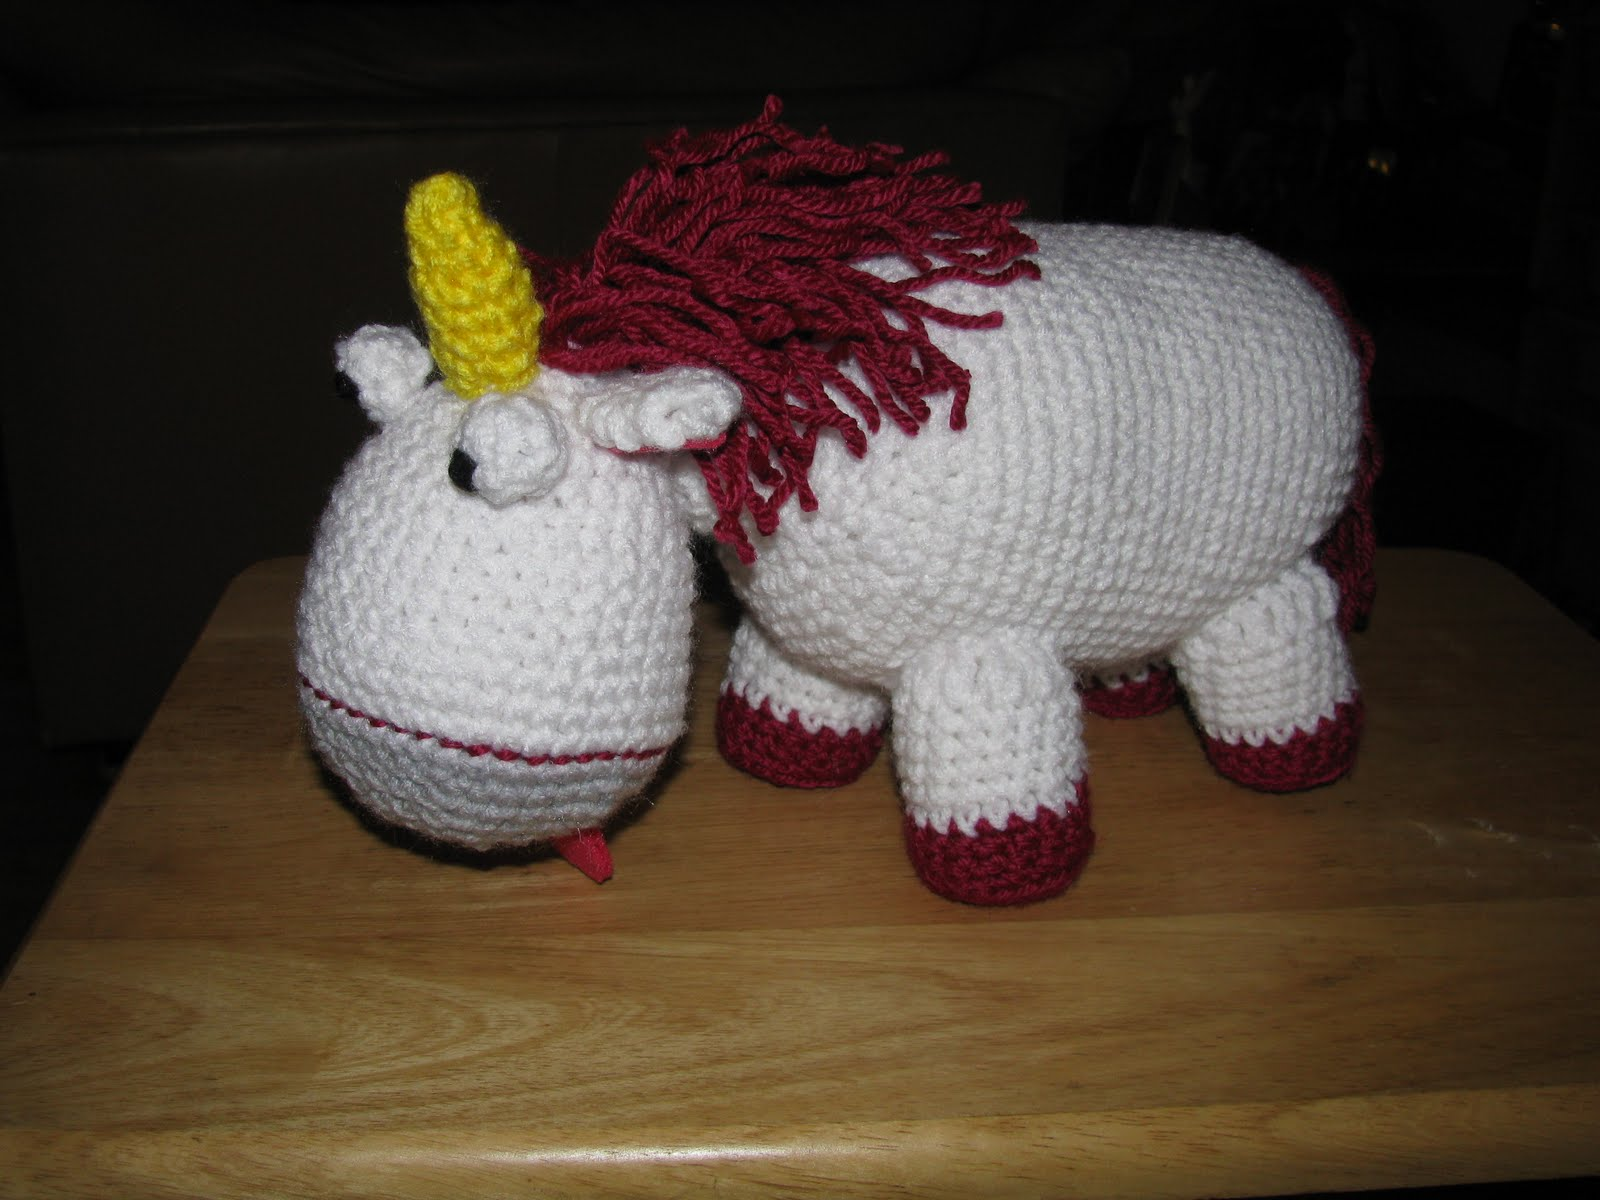 Amigurumi Unicornio Gru : Rad linc crafts unicorn amigurumi it s just despicable